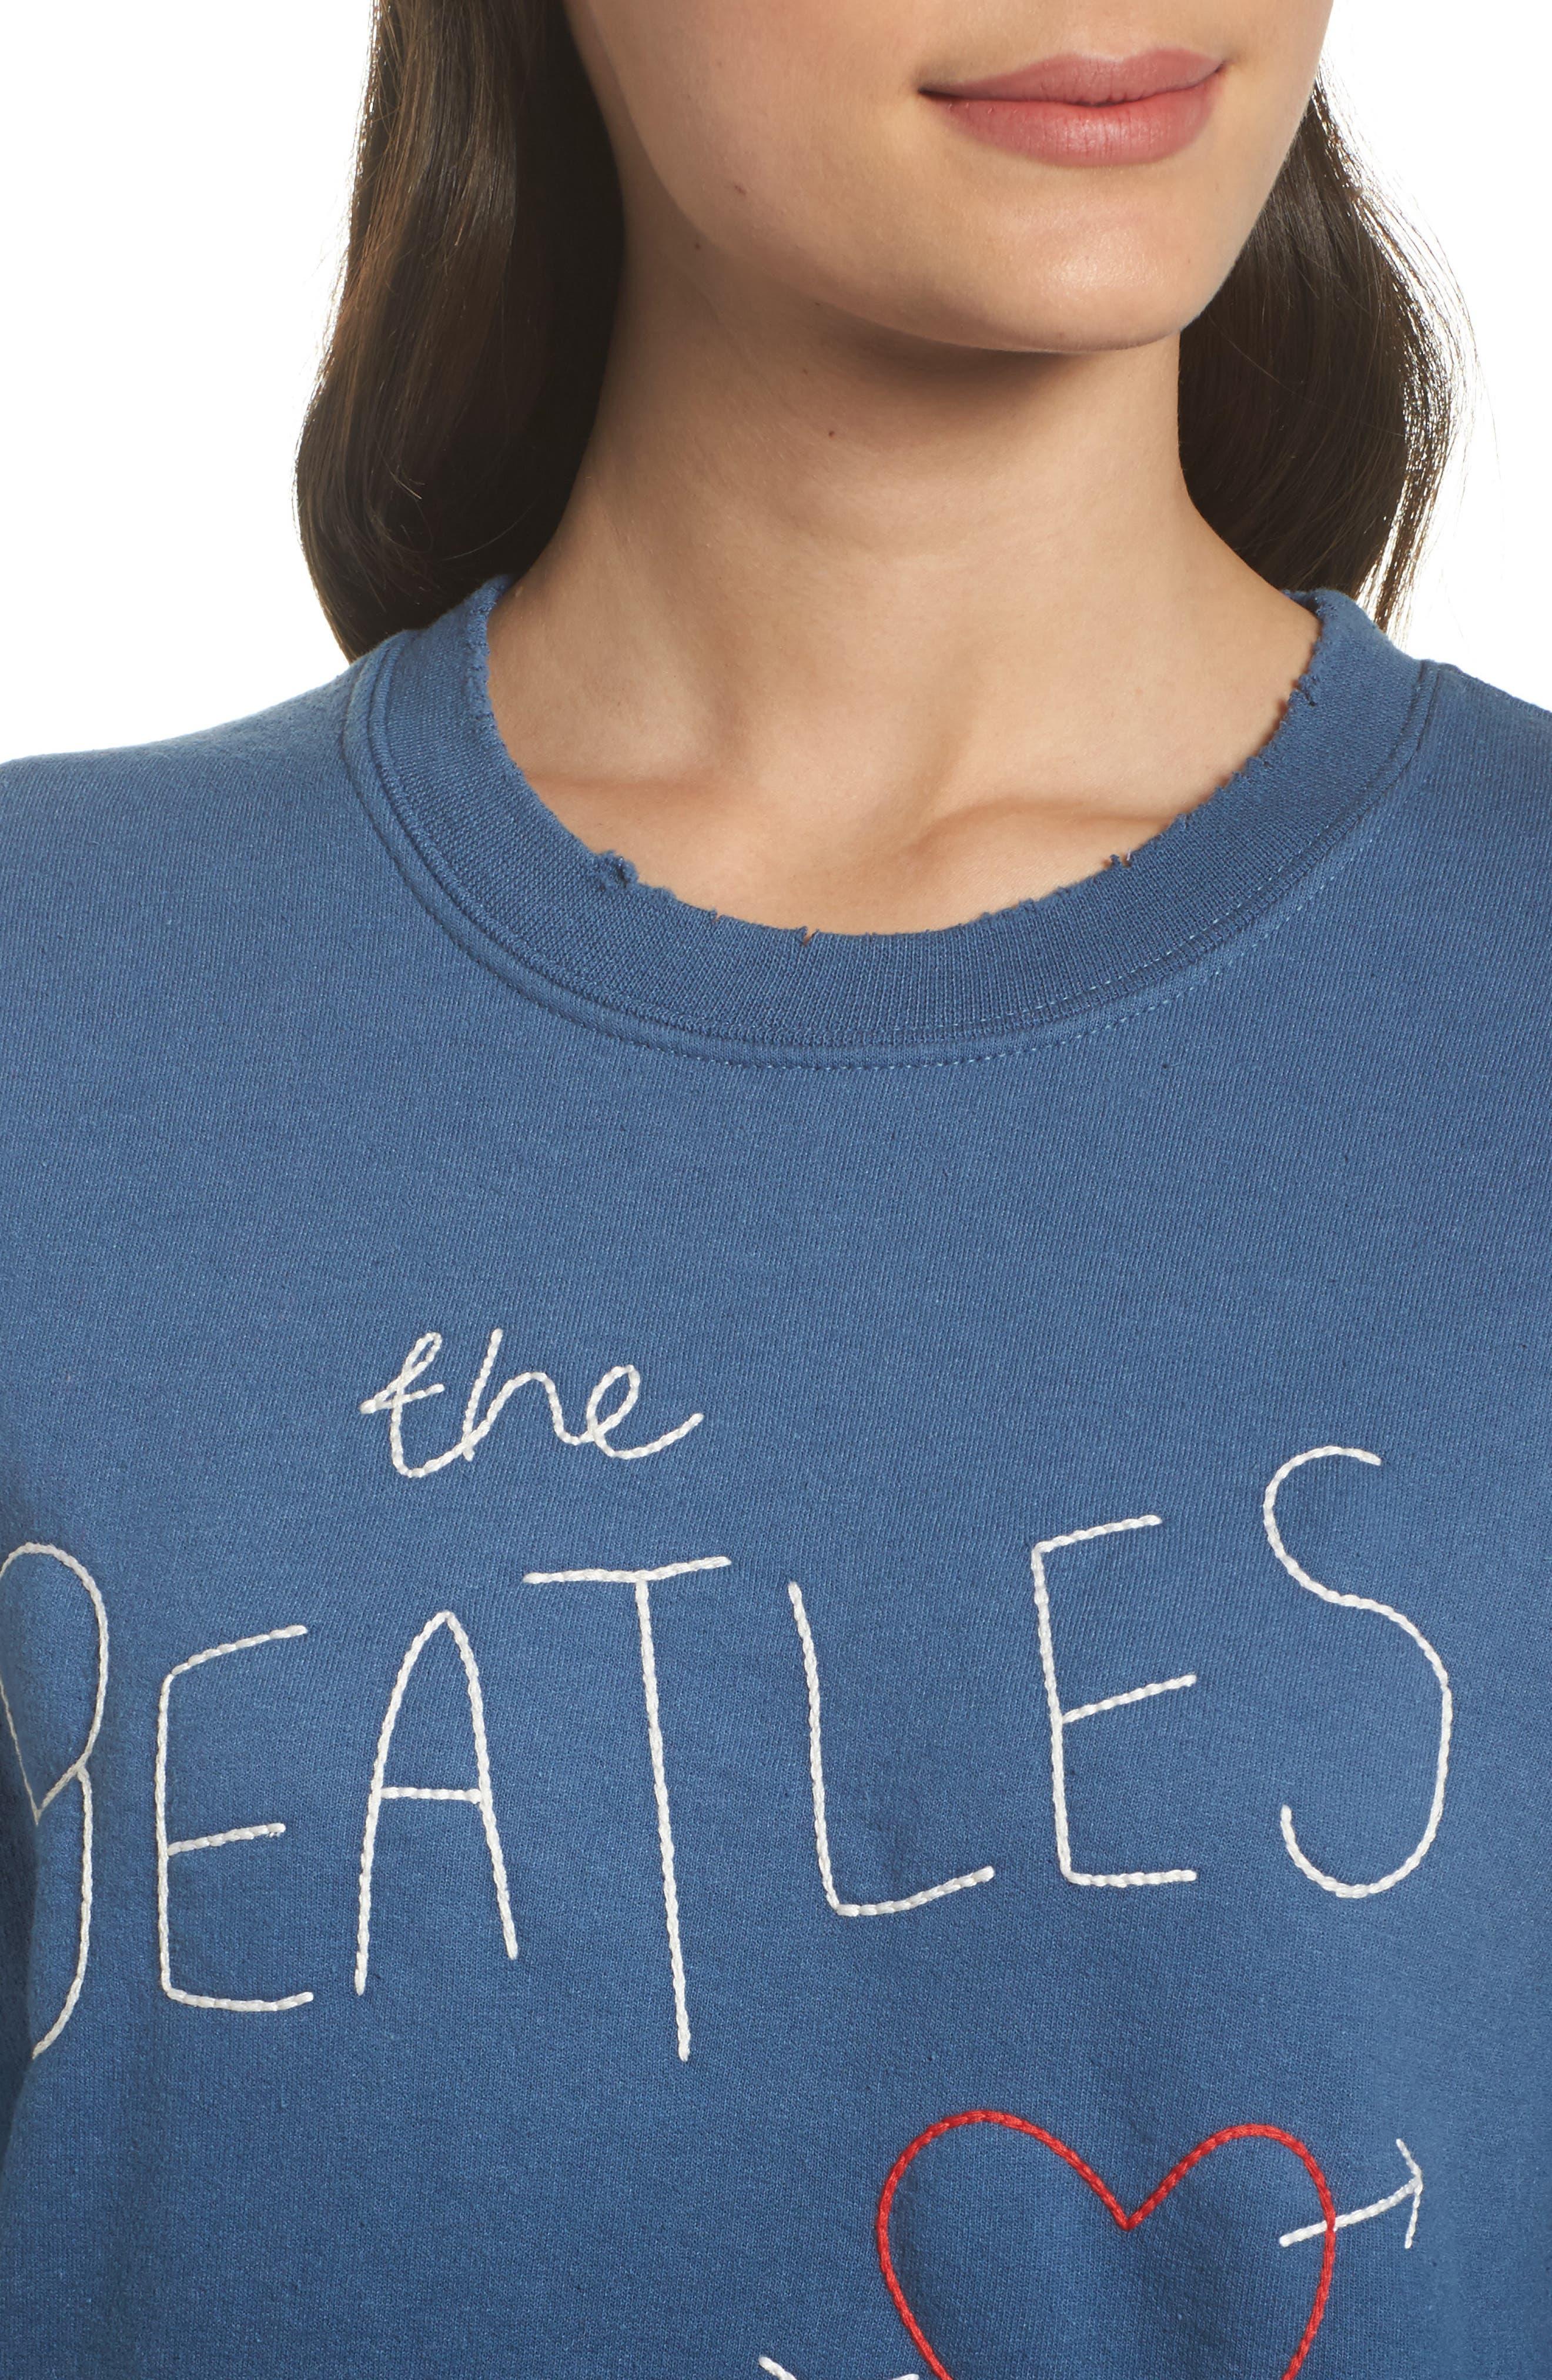 The Beatles Ombré Sweatshirt,                             Alternate thumbnail 5, color,                             True Navy